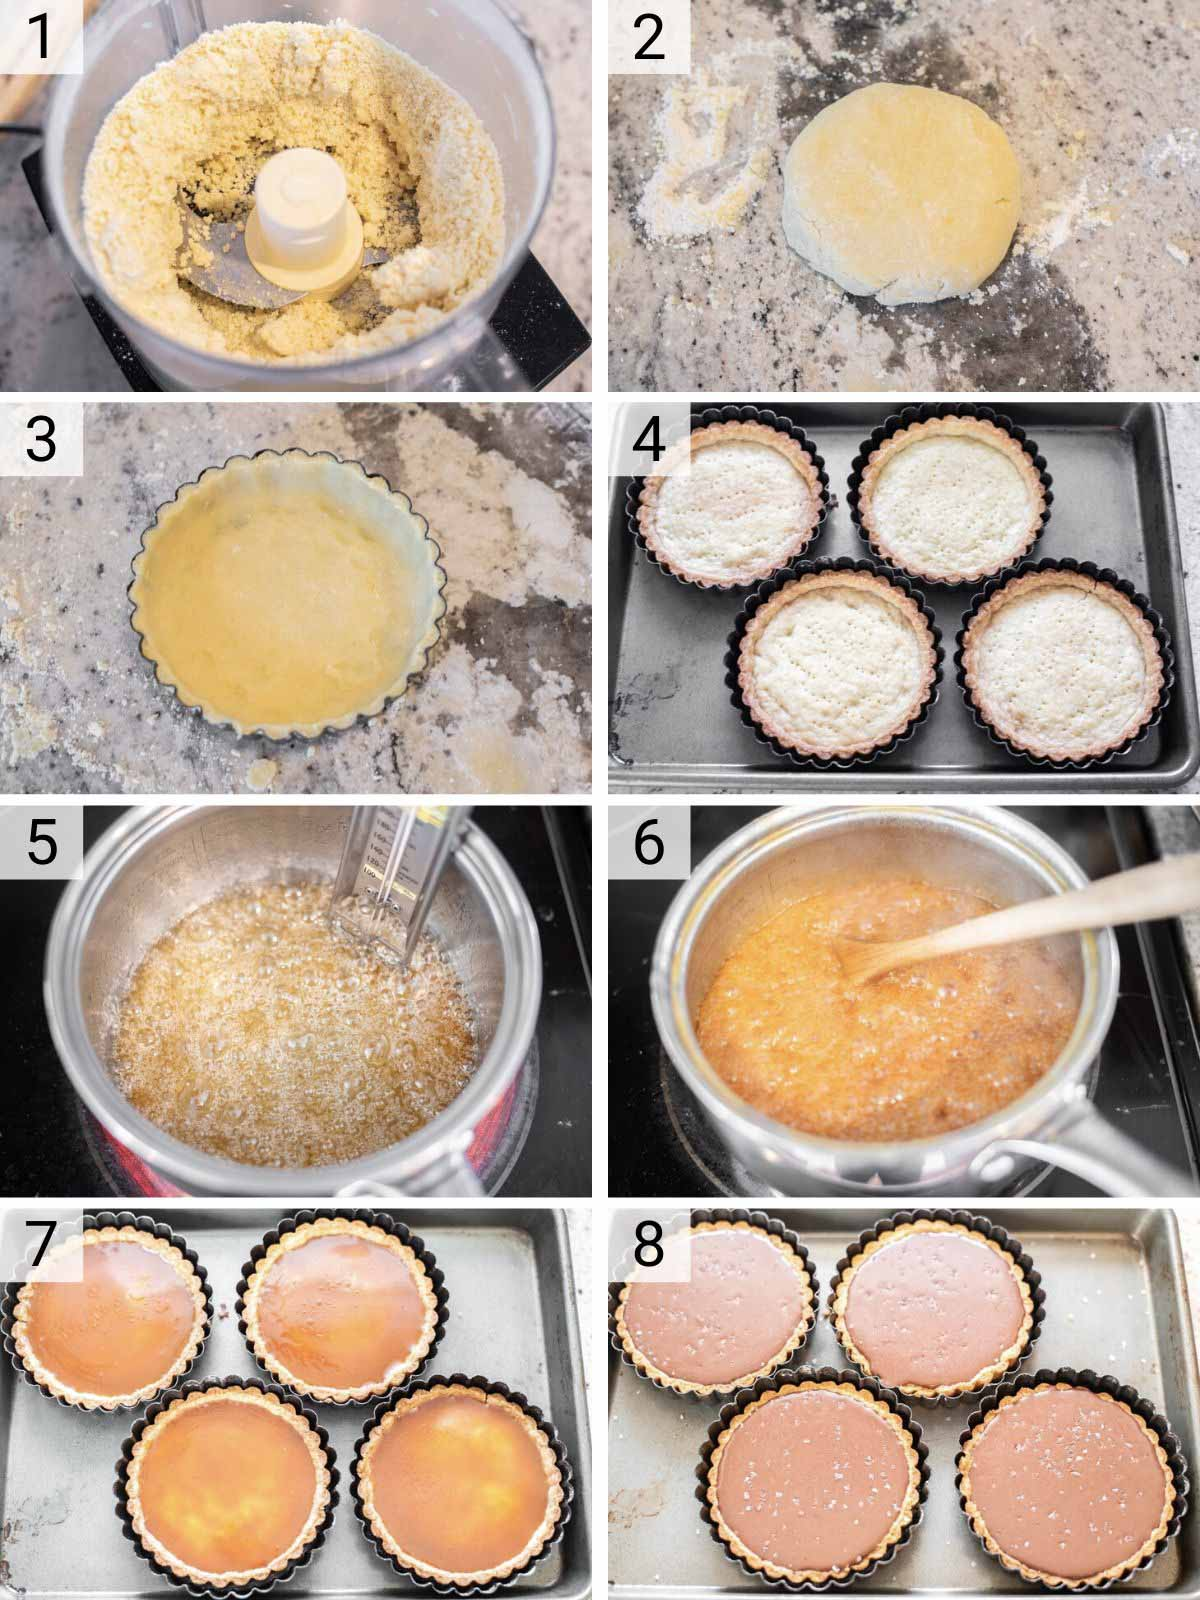 process shots of how to make chocolate caramel tart